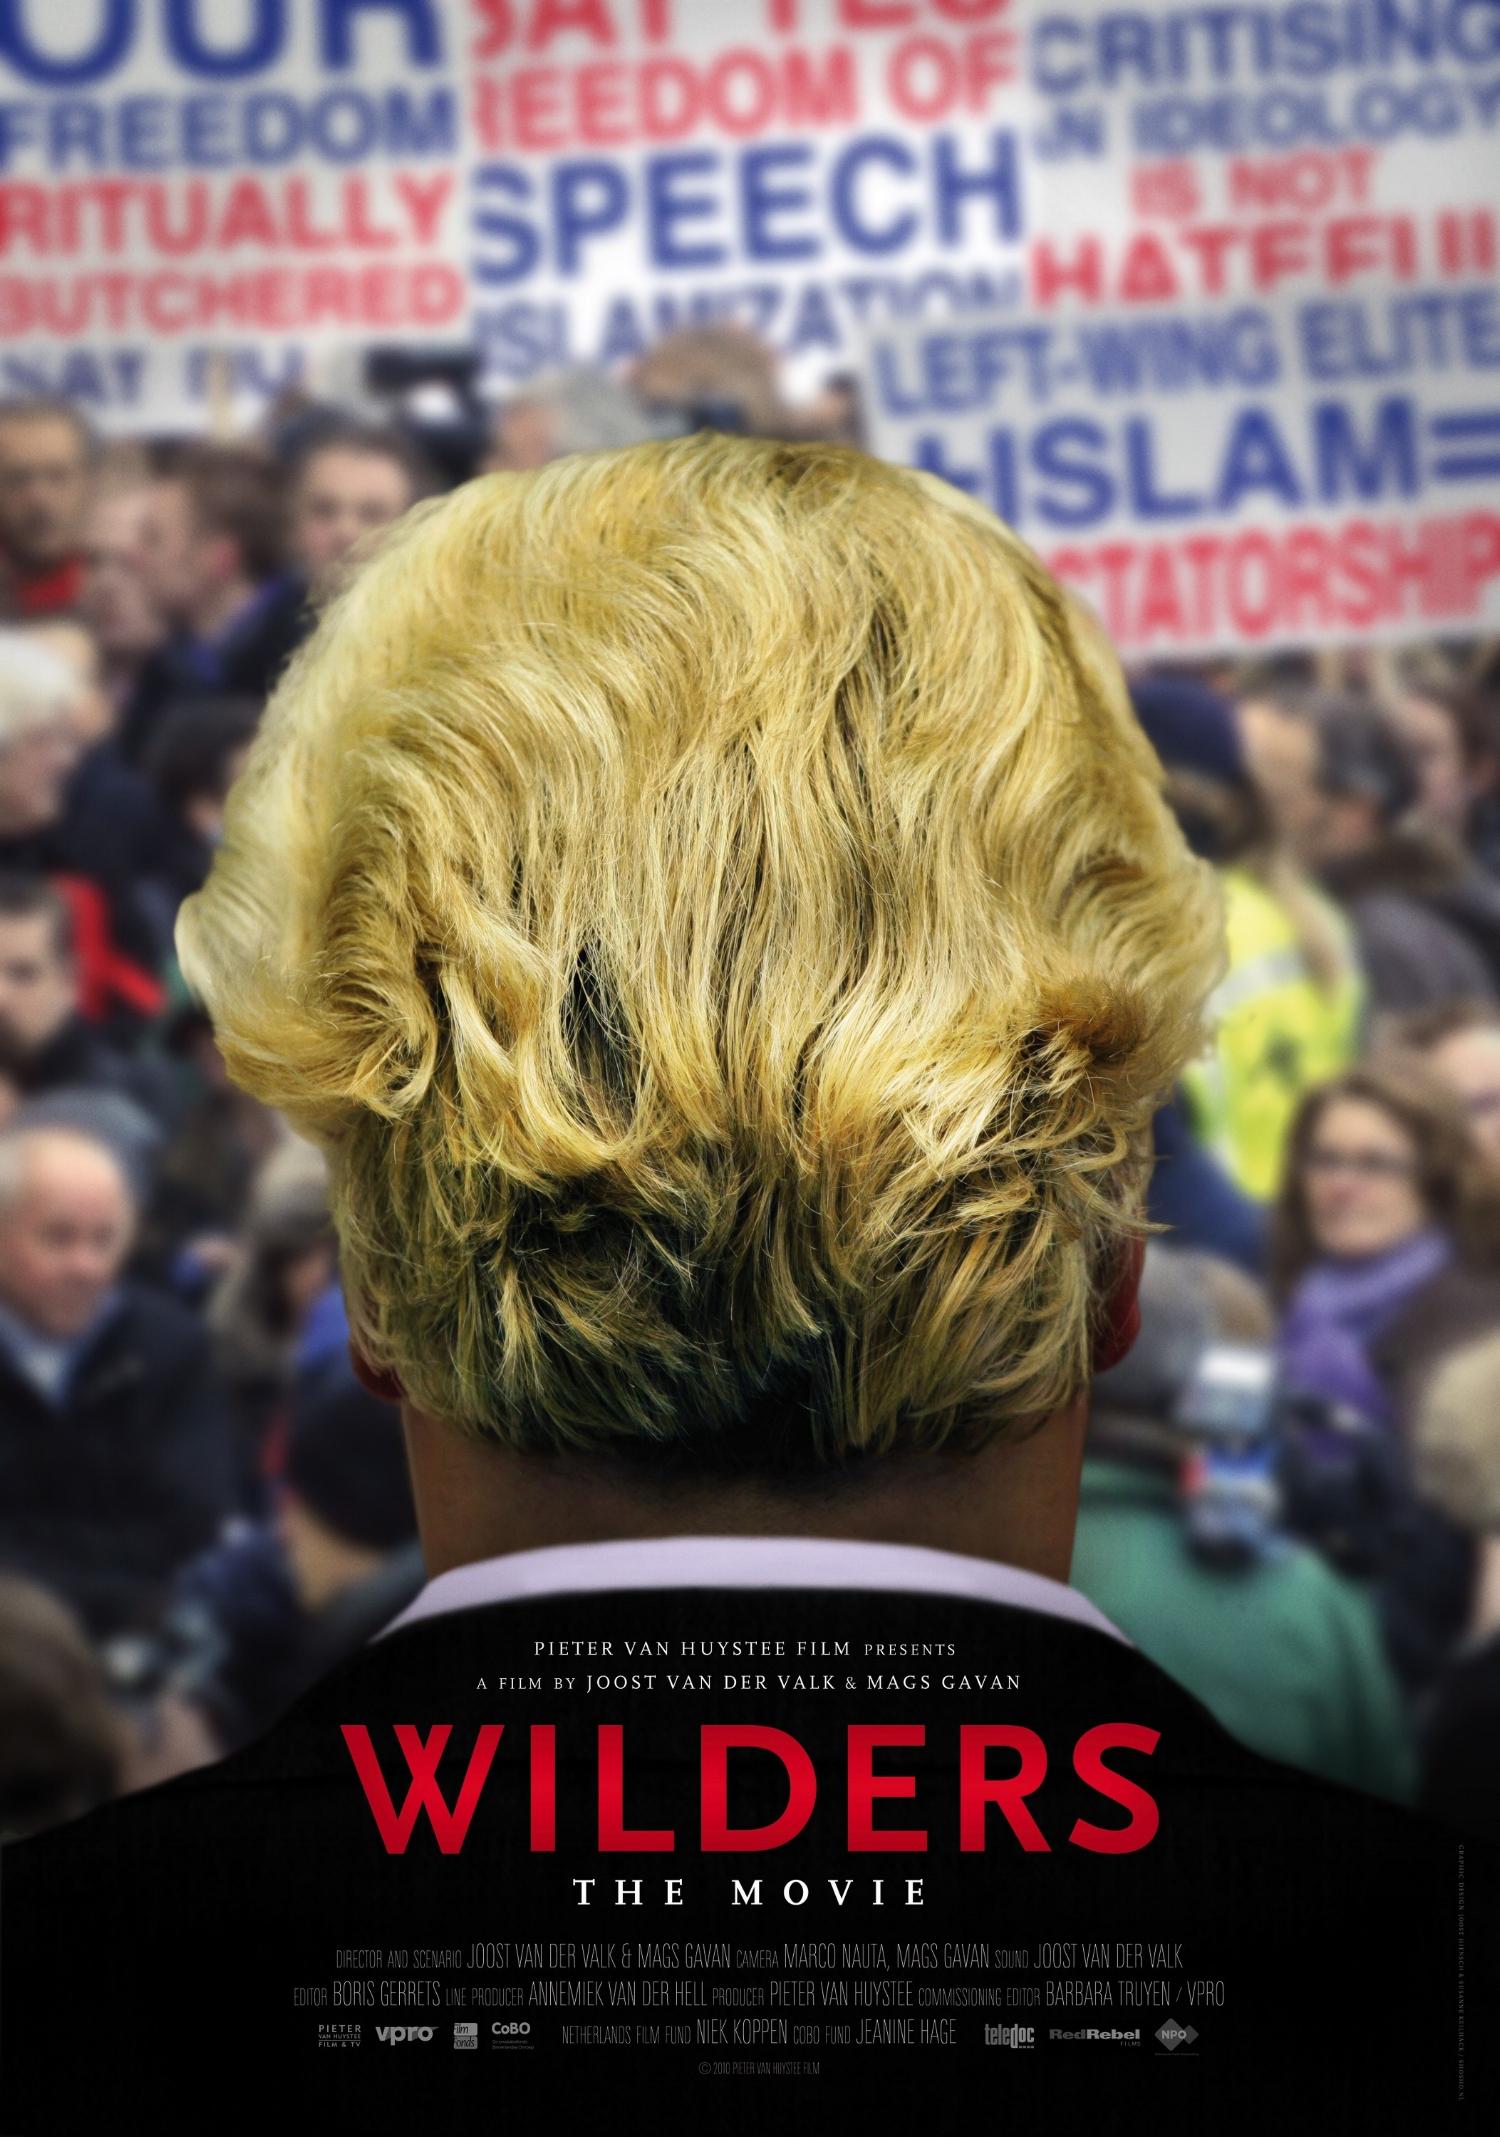 Wilders the Movie